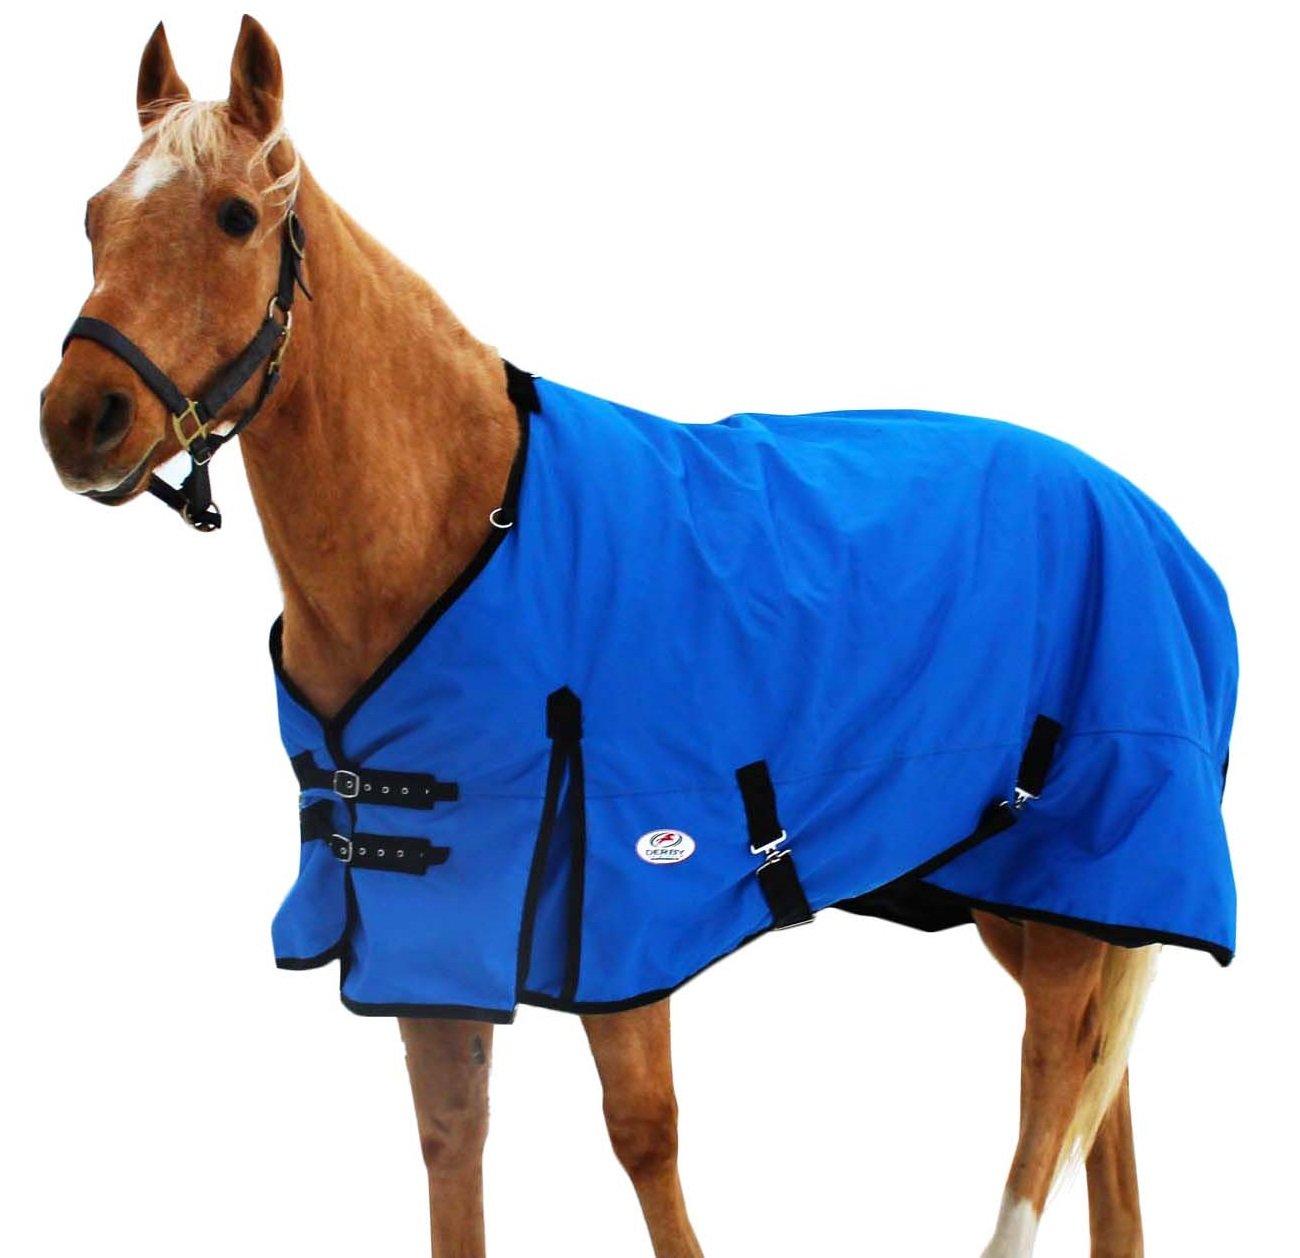 Derby Originals 1200D Heavy Duty Winter Horse Turnout Blanket, 72'', Blue